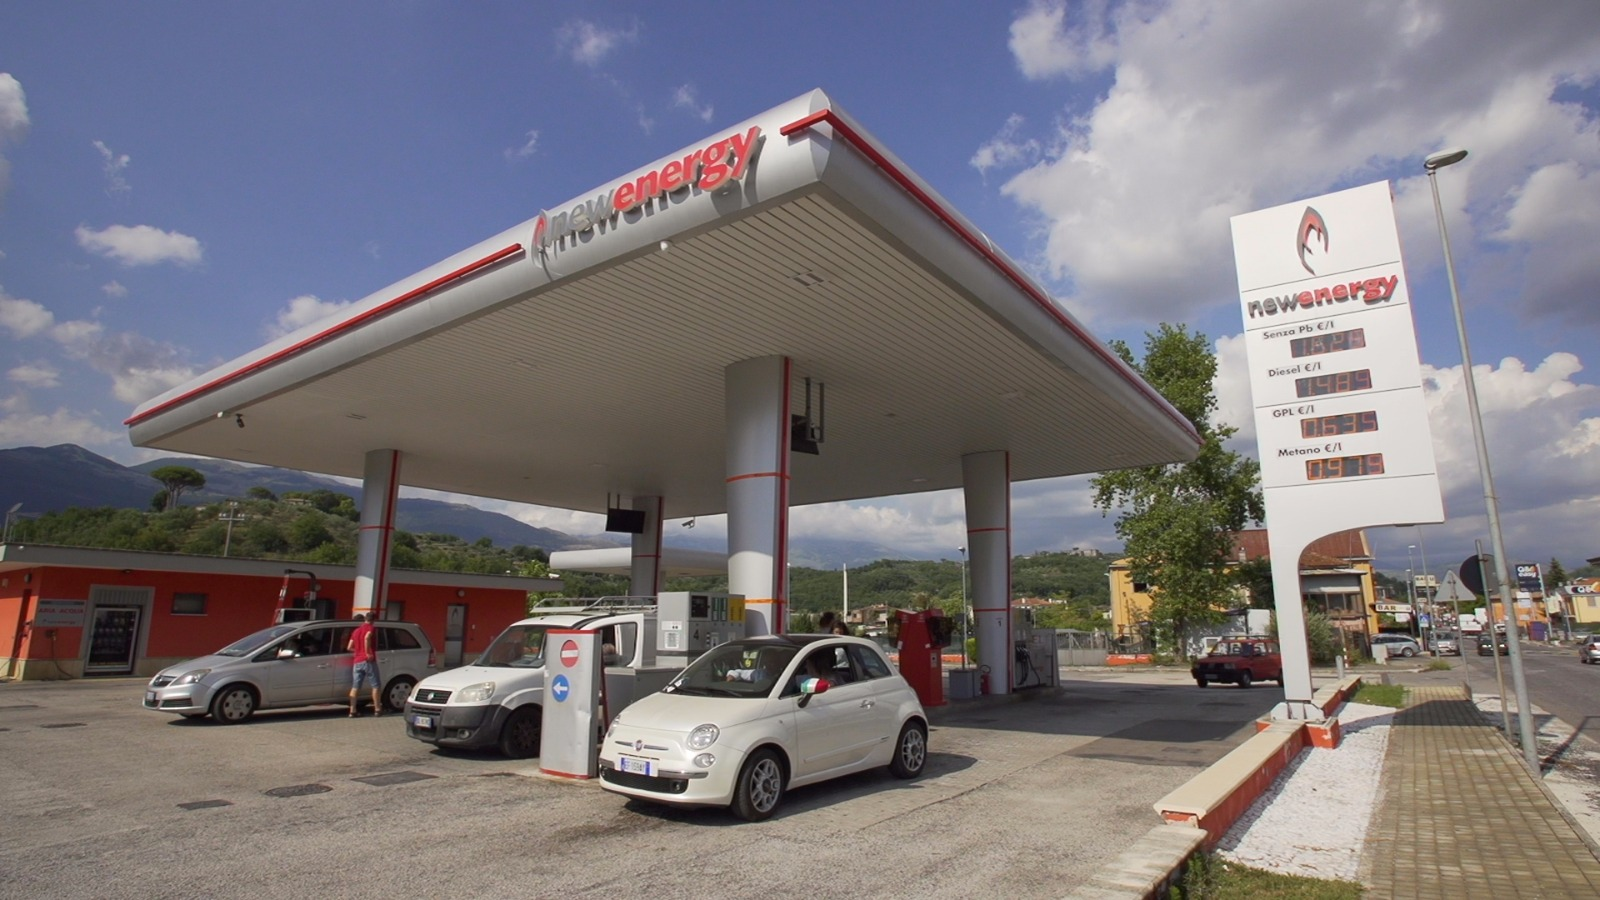 https://www.newenergycarburanti.it/wp-content/uploads/2018/07/WhatsApp-Image-2018-07-18-at-15.13.30-1.jpeg